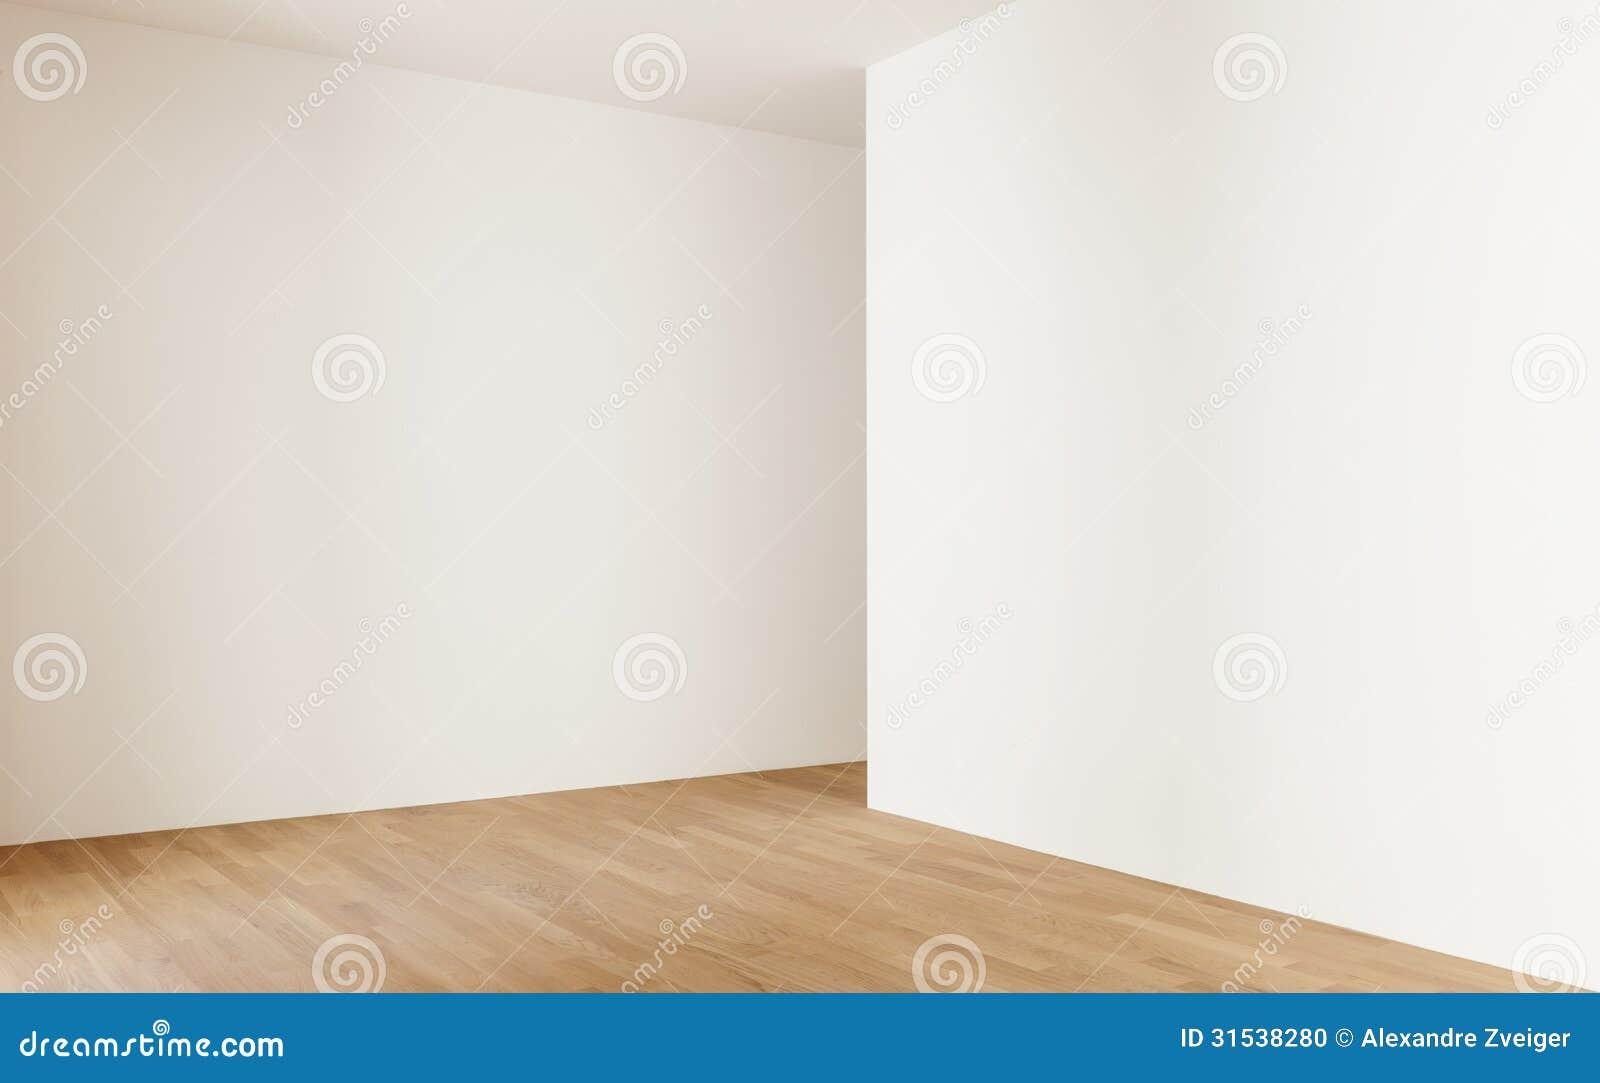 Room White Walls Stock Photo Image 31538280